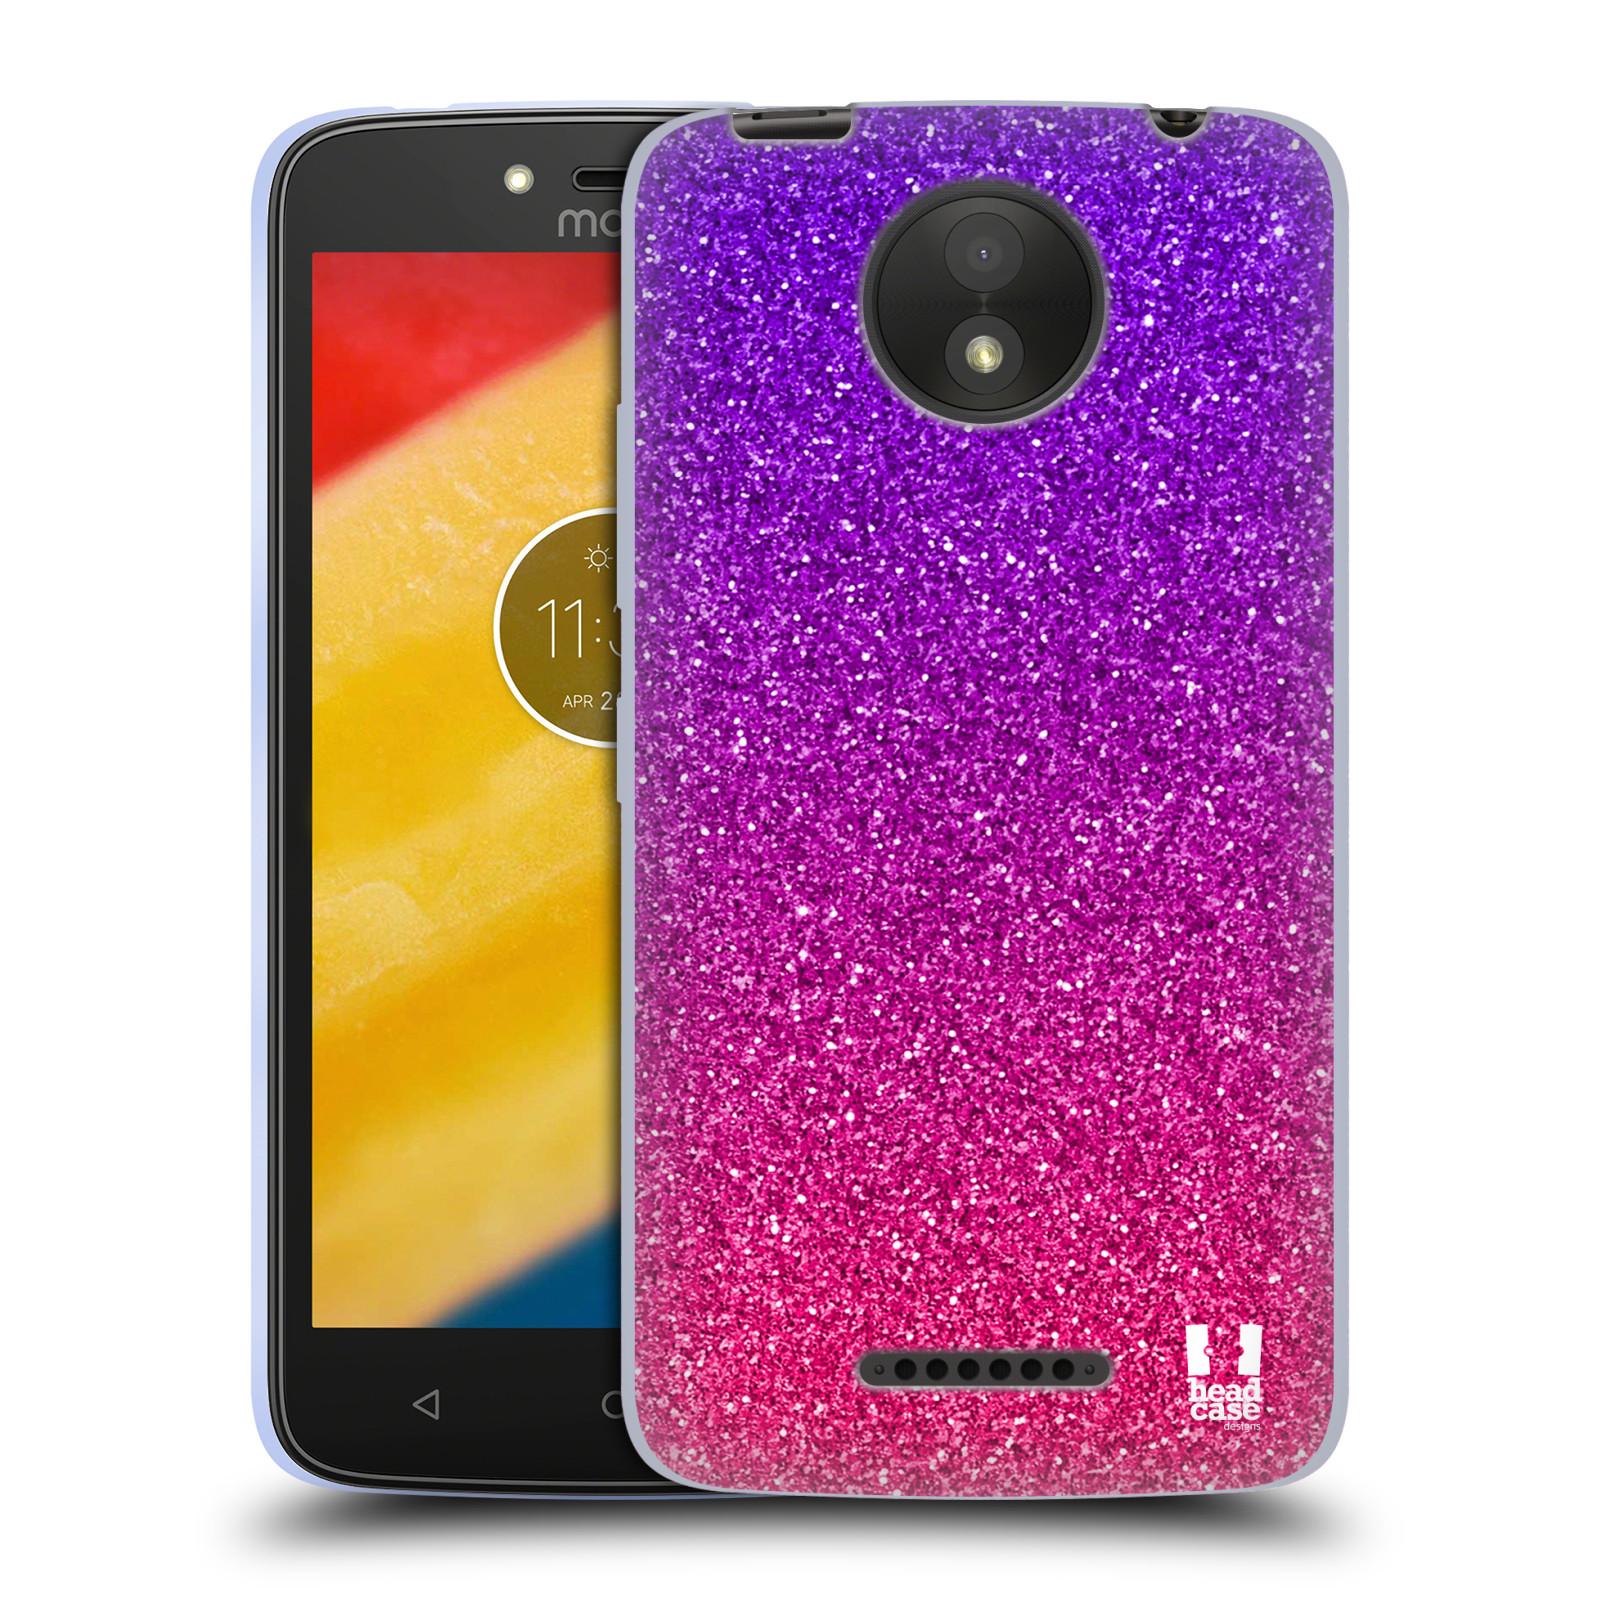 Silikonové pouzdro na mobil Lenovo Moto C Plus - Head Case - Mix Pink (Silikonový kryt či obal na mobilní telefon Lenovo Moto C Plus s motivem Mix Pink)